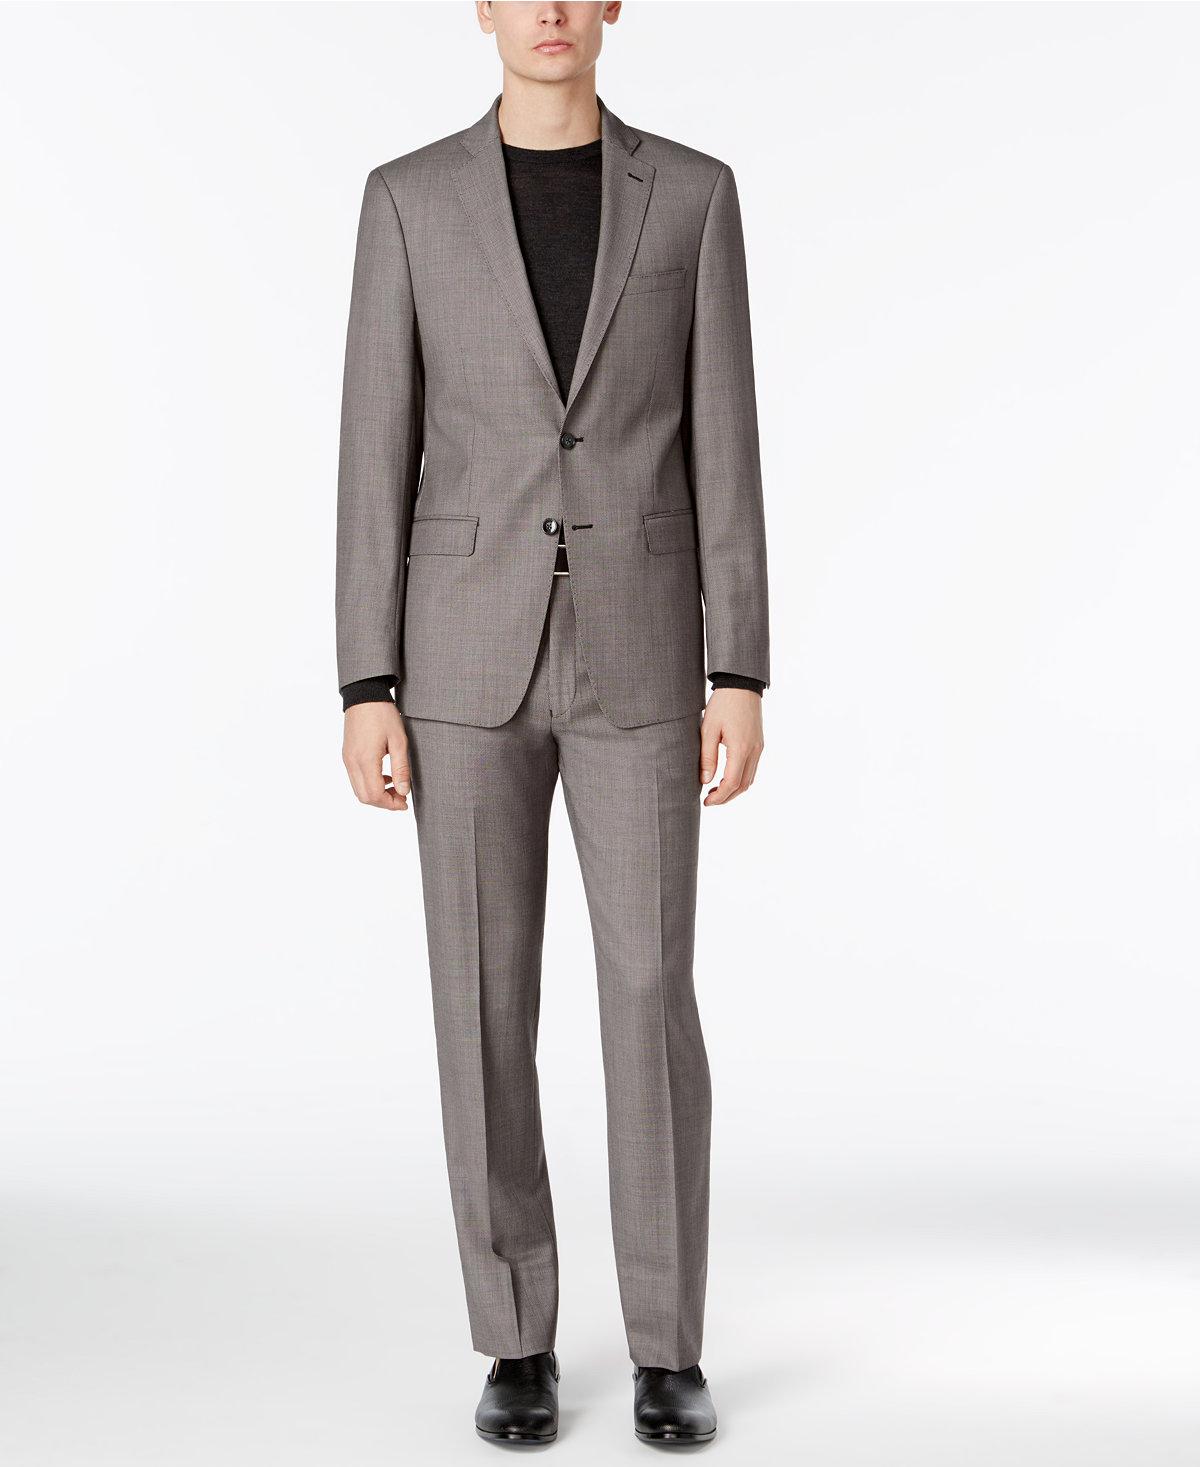 Calvin Klein Men's Extra-Slim Fit Black/White Birdseye Suit - $104.99 + Free S/H $104.79